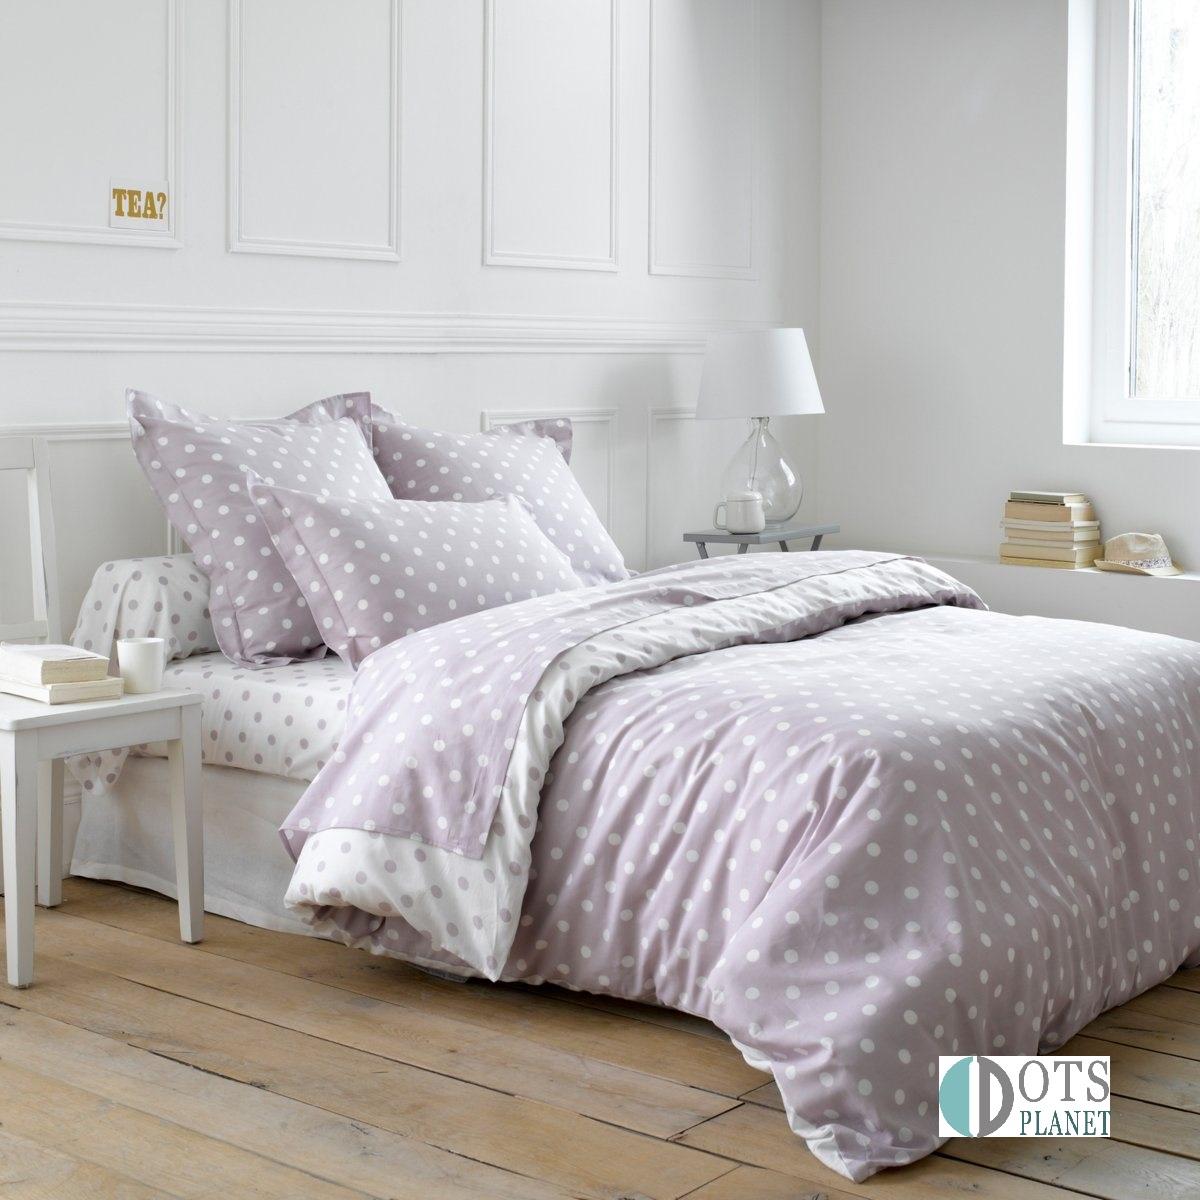 po ciel jagodowe groszki kropki 140x200. Black Bedroom Furniture Sets. Home Design Ideas